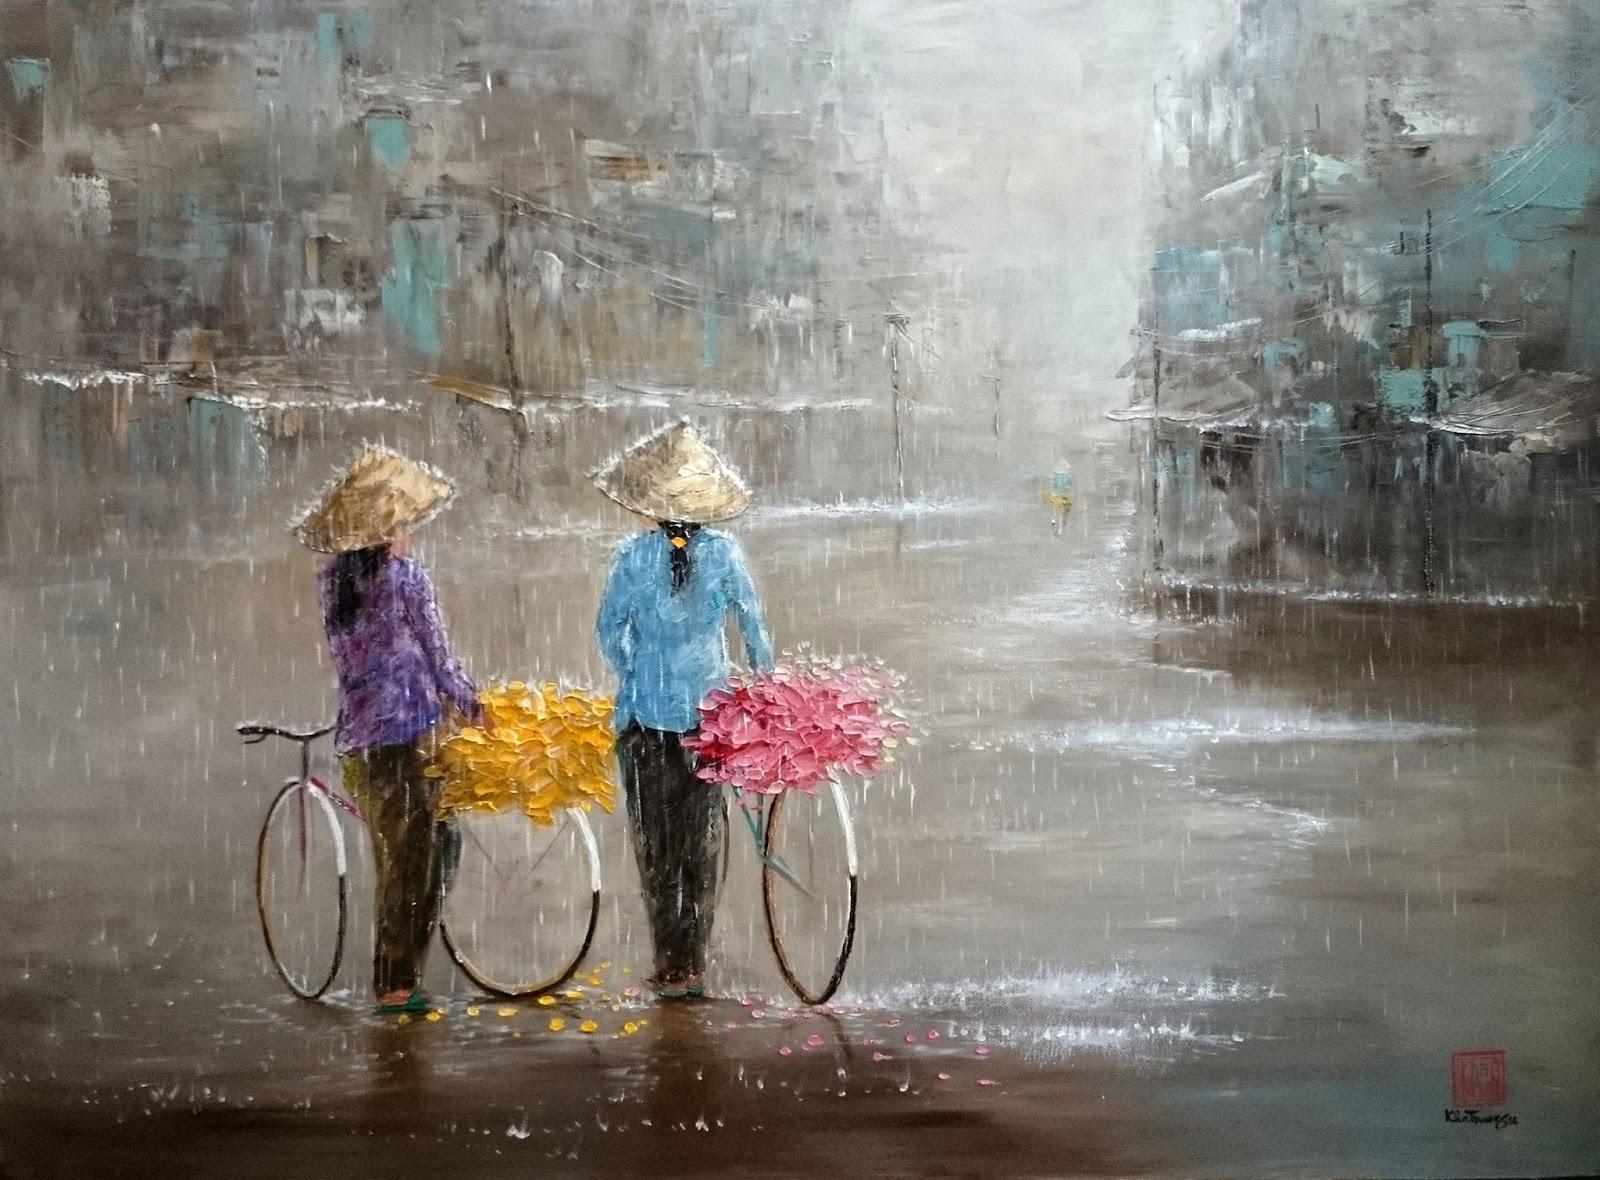 Kha Trung cultural abstract painting